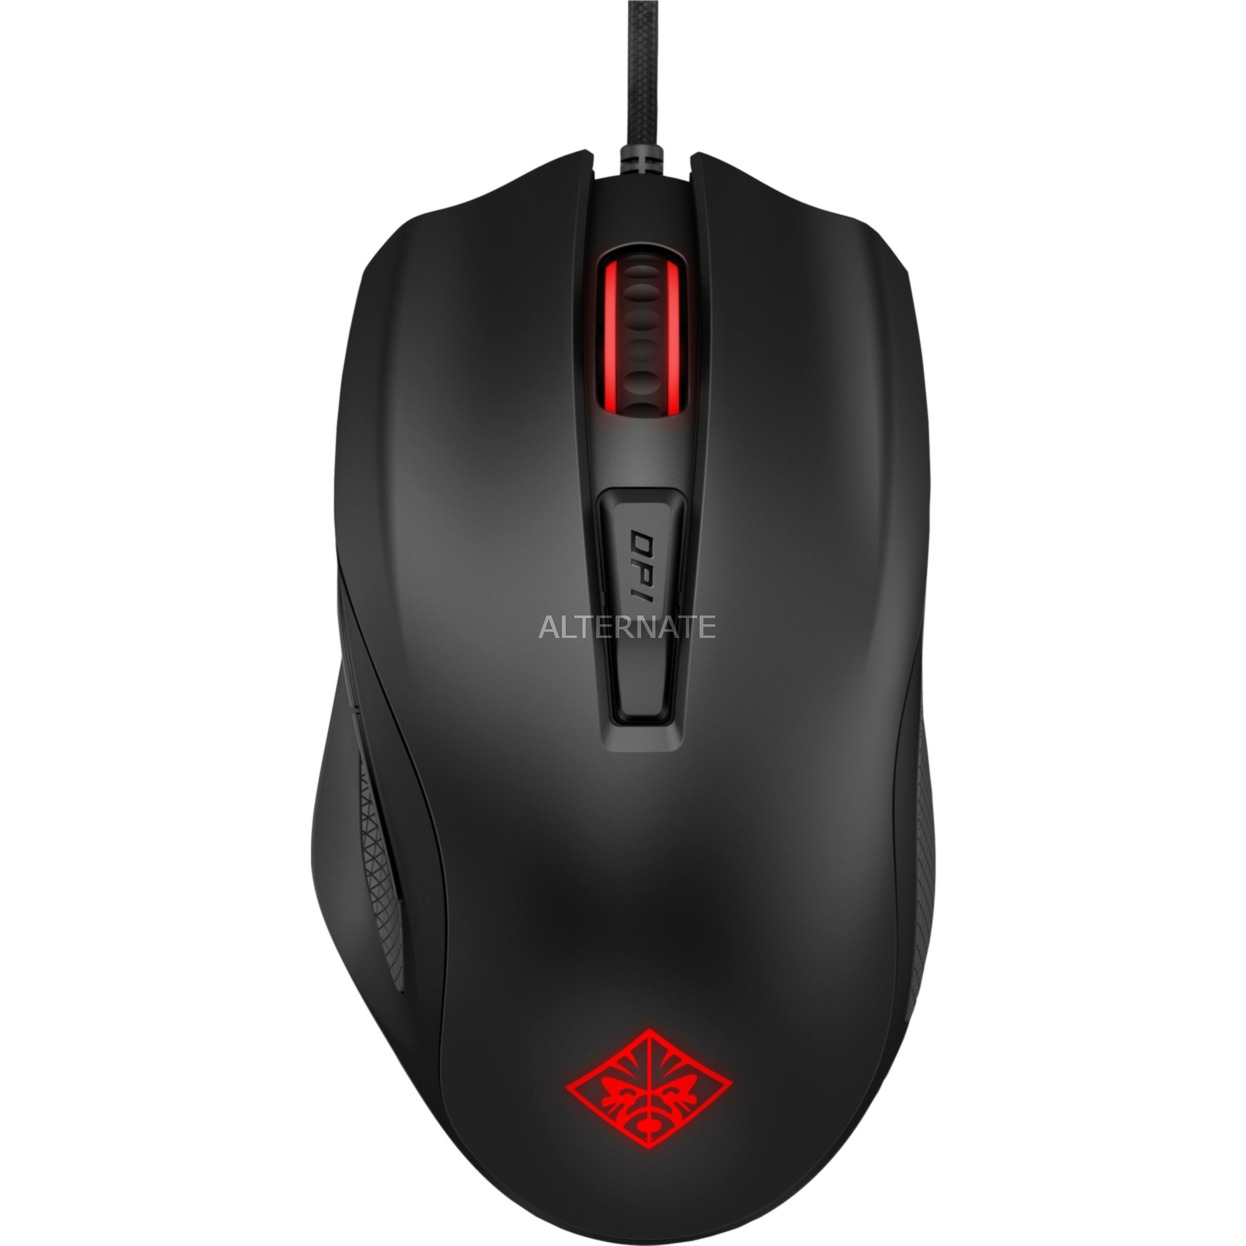 600 ratón USB Óptico 12000 DPI mano derecha Negro, Rojo